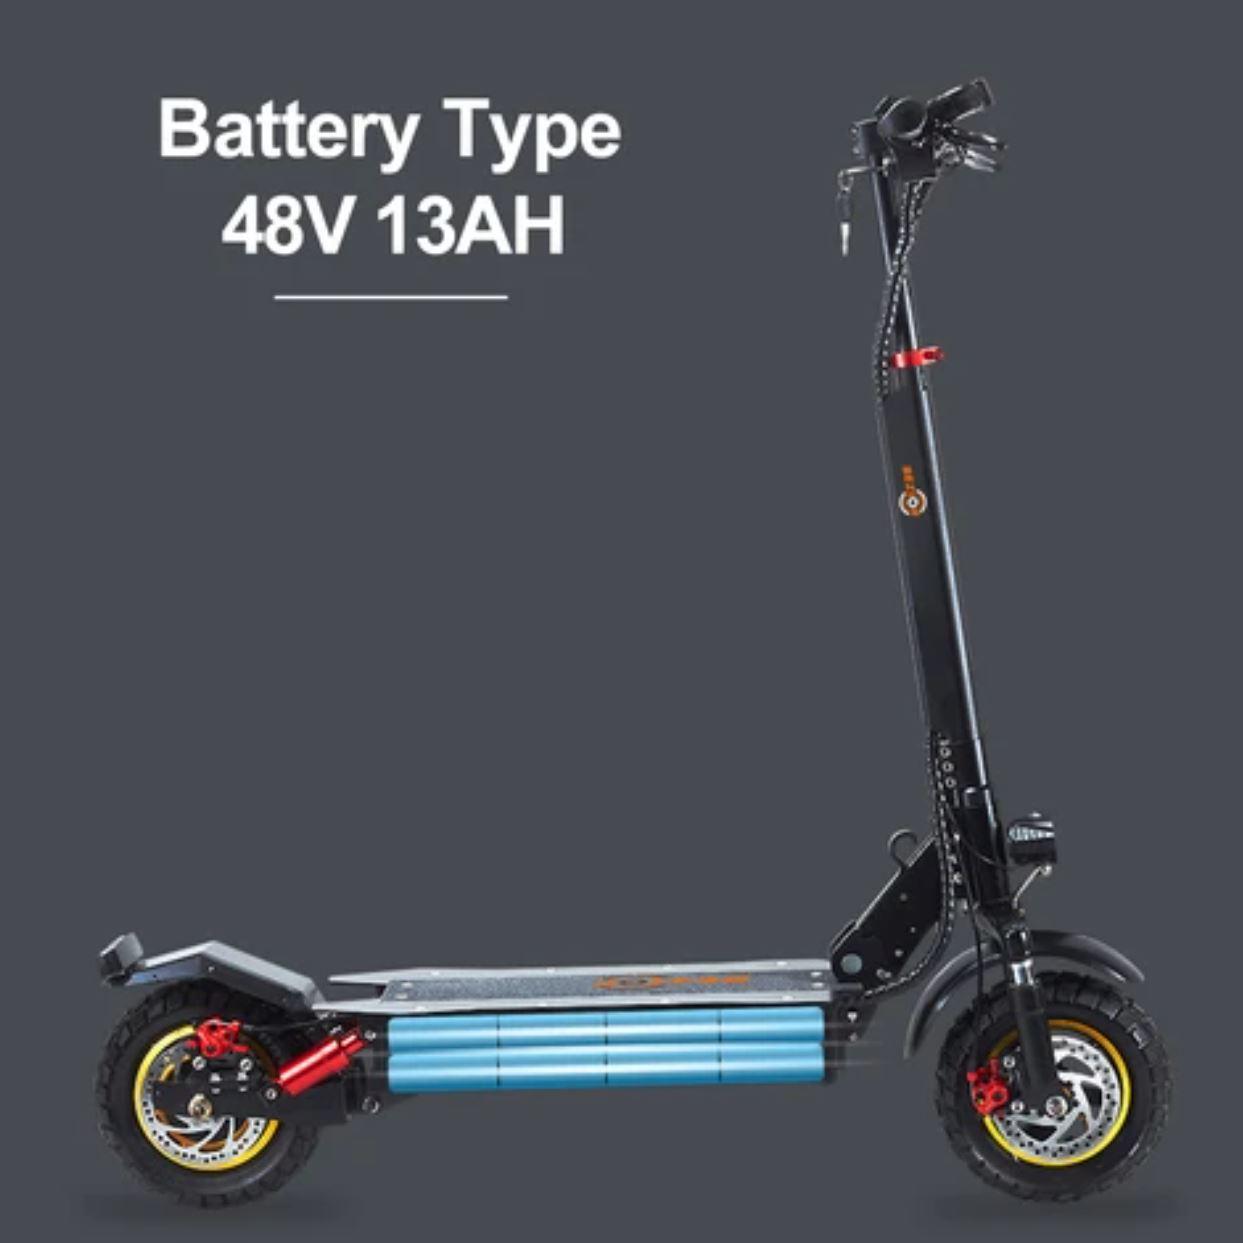 hulajnoga elektryczna Bezior S1 - bateria